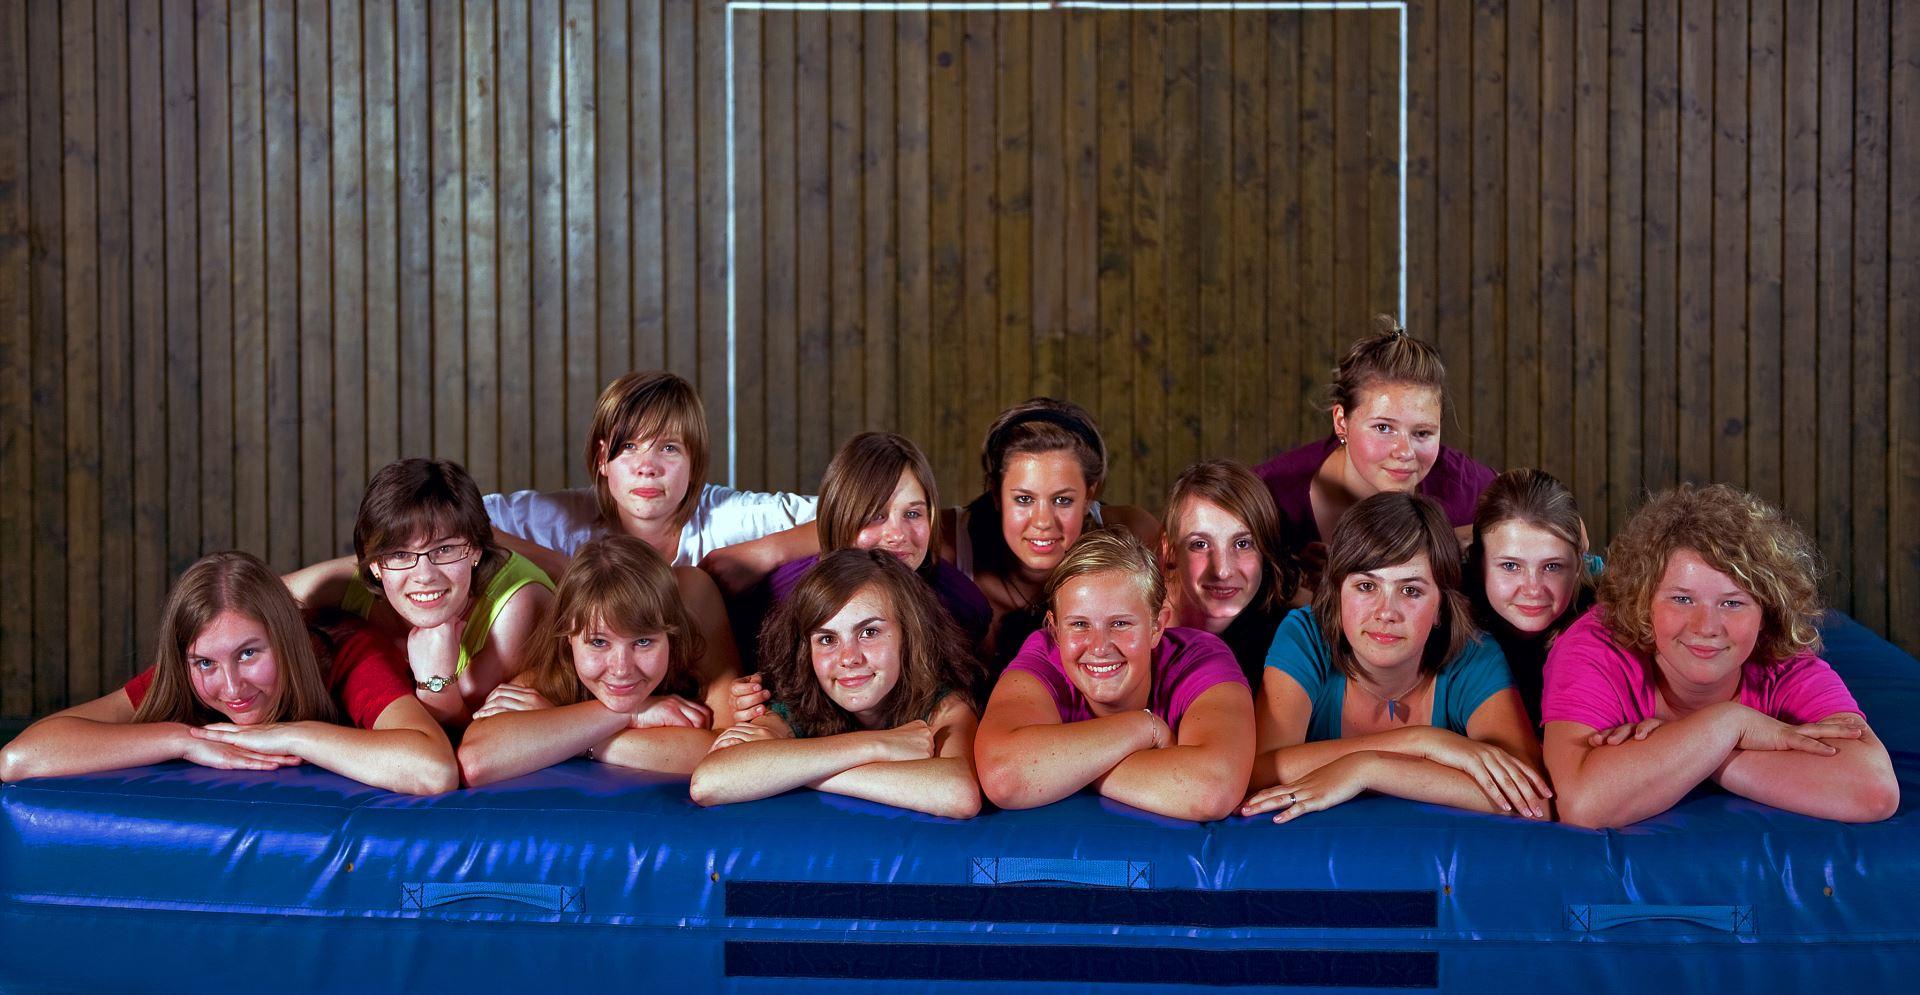 Jugendturnen (Gruppe 1) im Jahr 2010 (03)